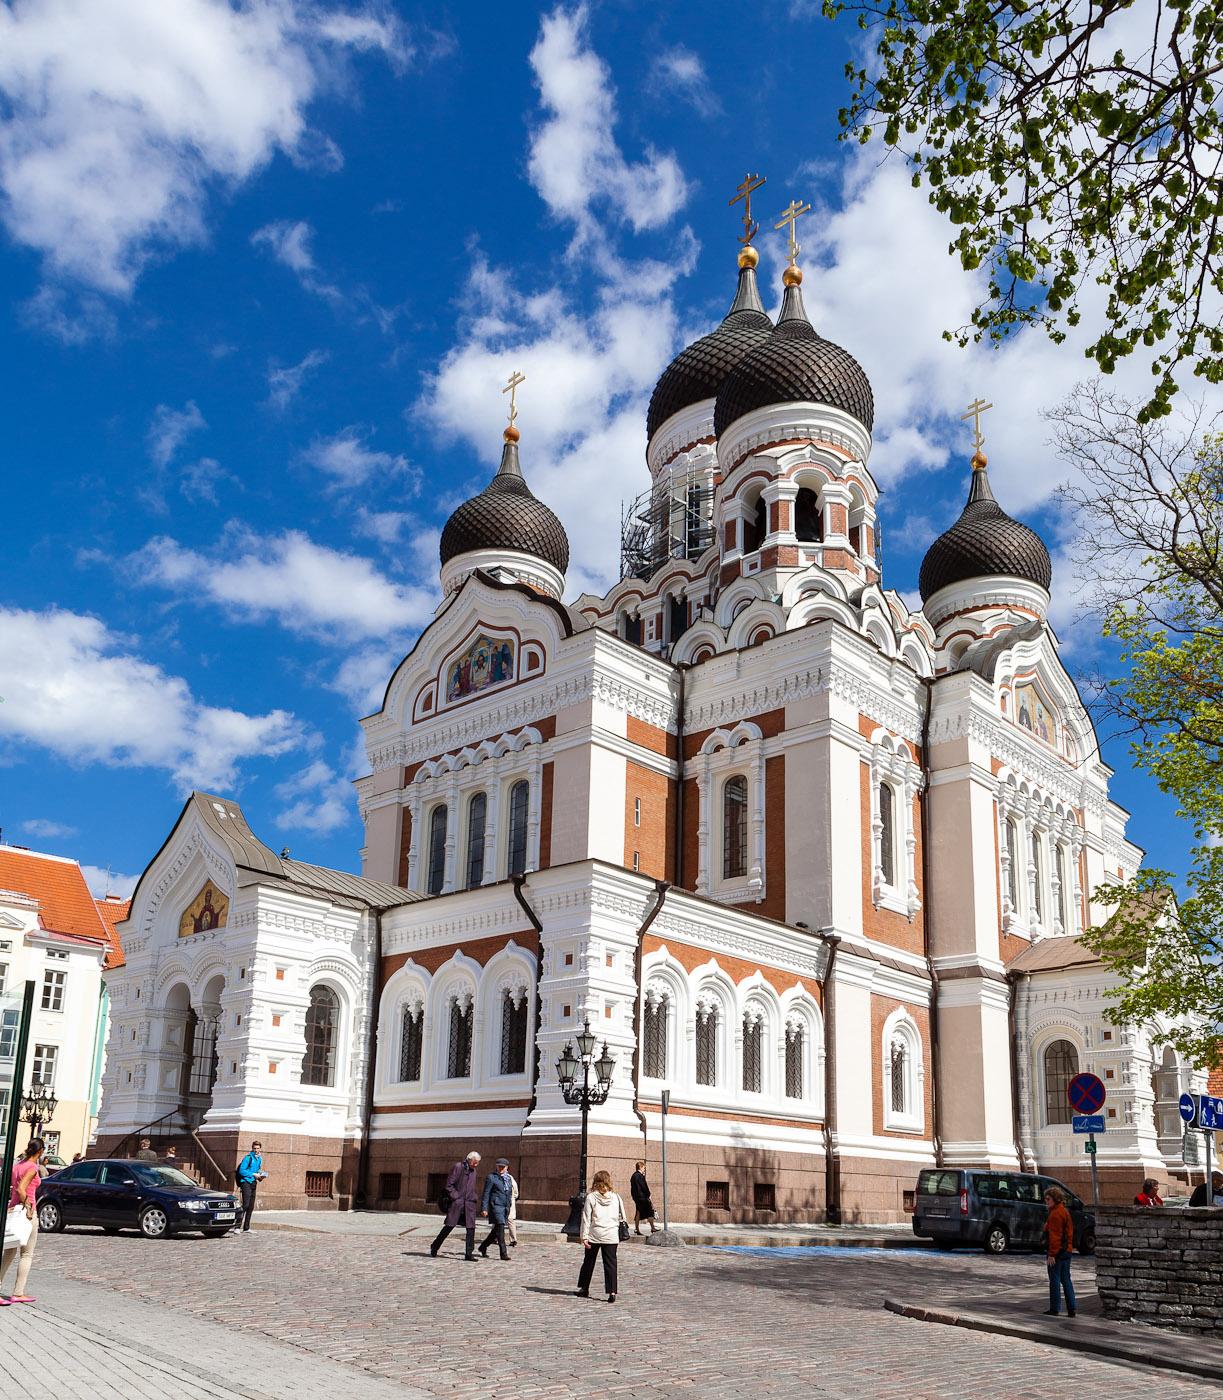 tallinn old town walking tour tallinn tours estonian. Black Bedroom Furniture Sets. Home Design Ideas